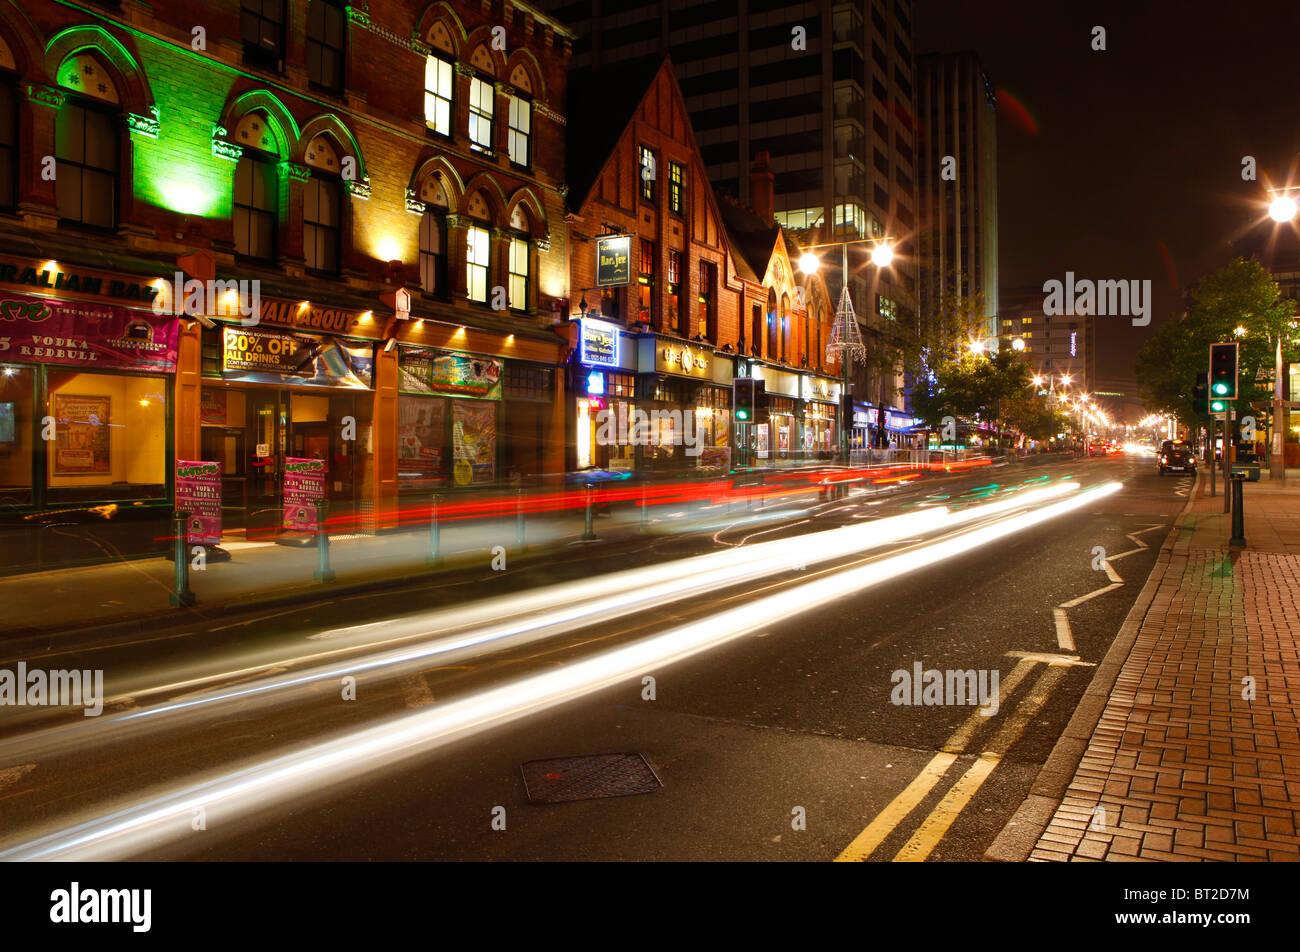 Broad Street at night, Birmingham, West Midlands, England, UK - Stock Image